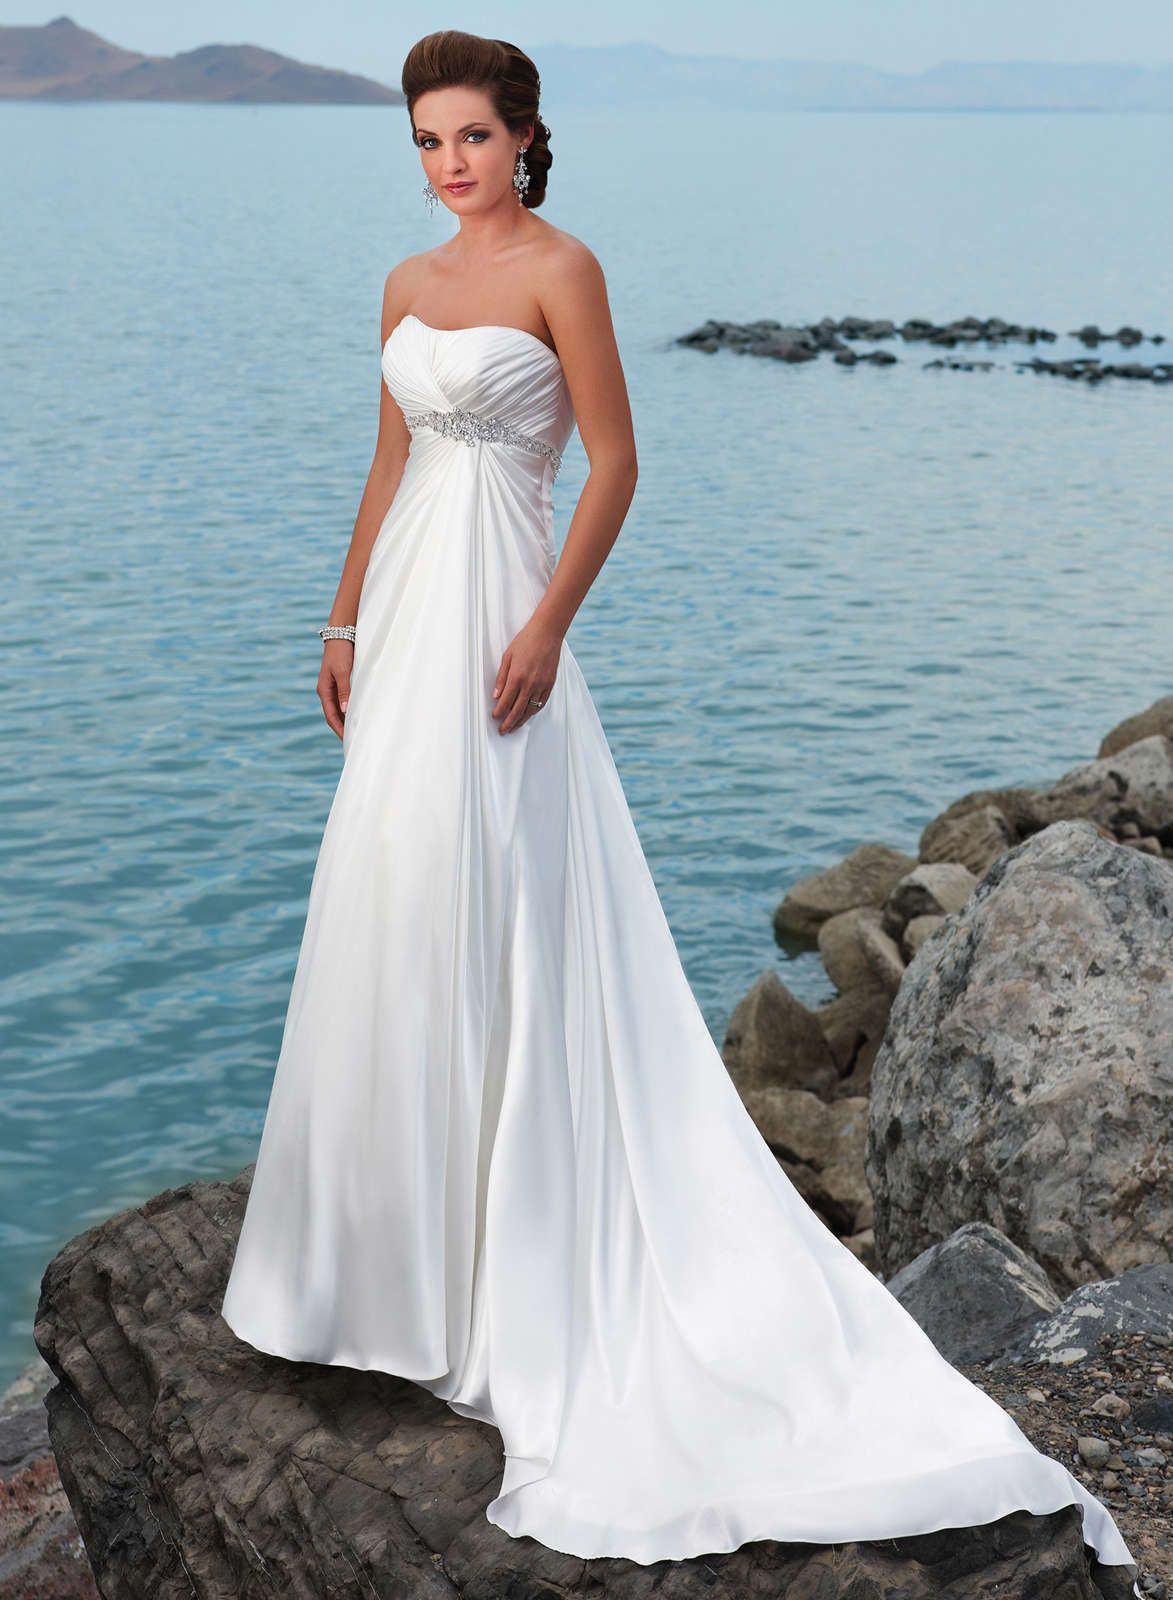 Old Fashioned Vestidos De Novia Ibiza Images - All Wedding Dresses ...